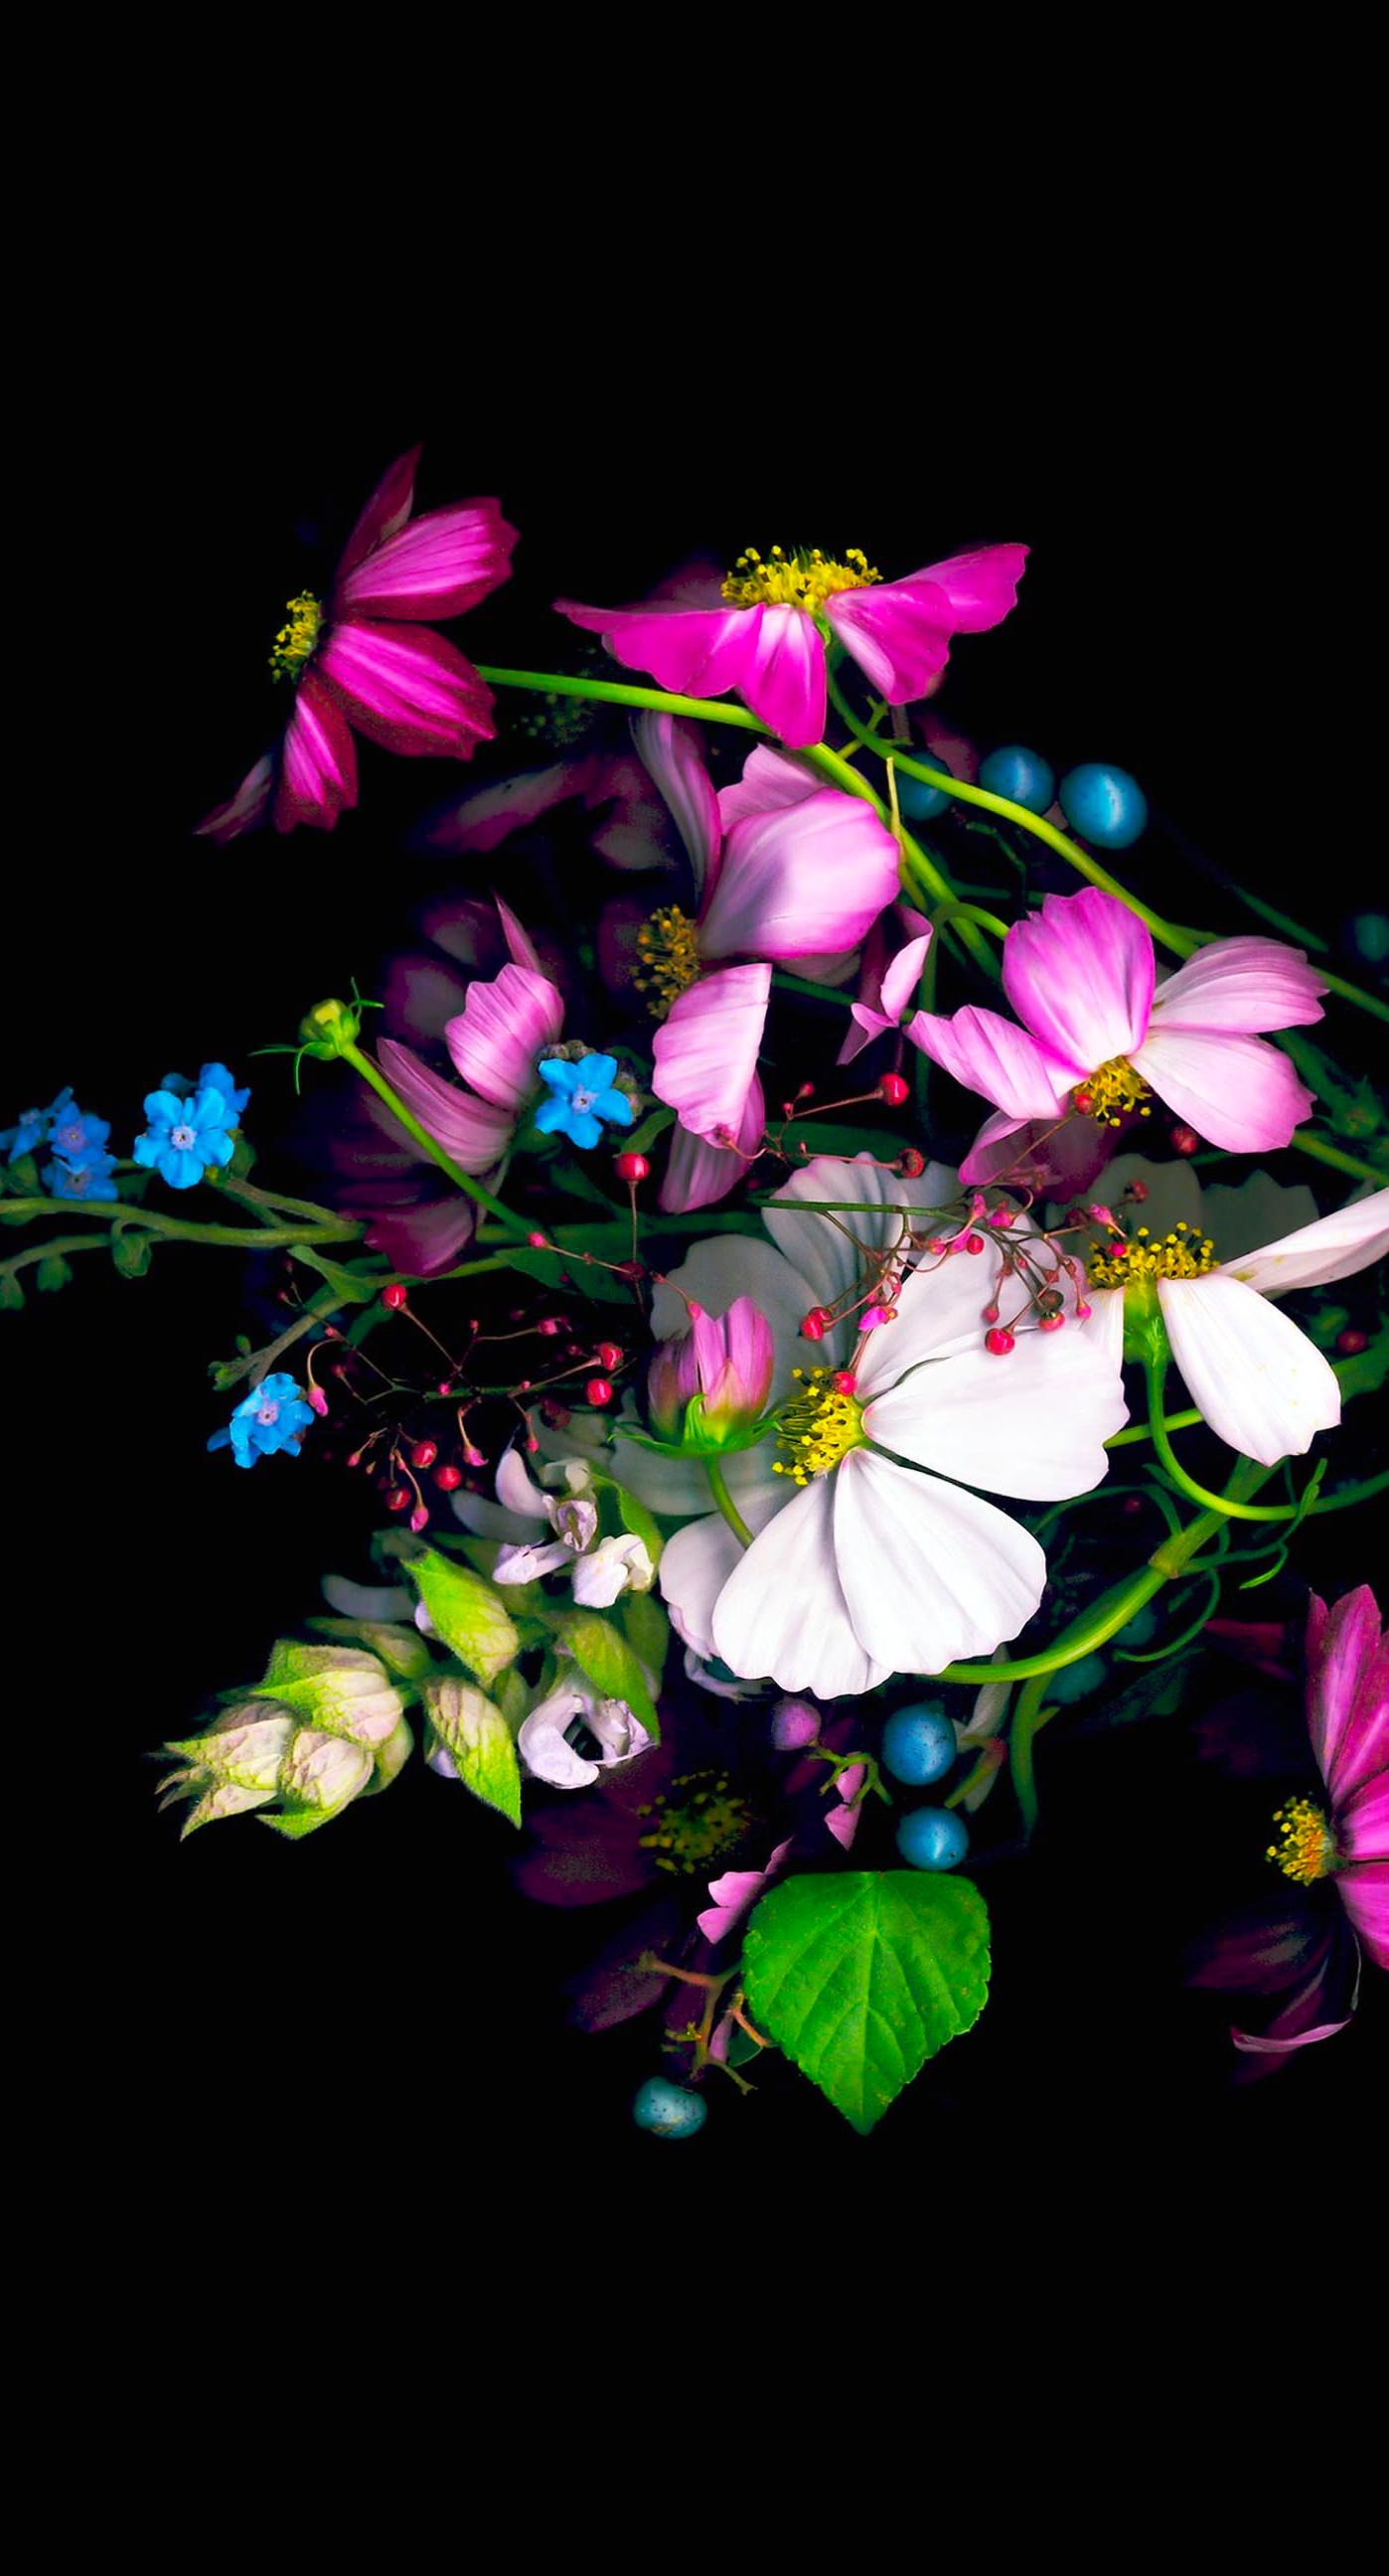 Colorful Flower Black Wallpaper Sc Iphone6splus